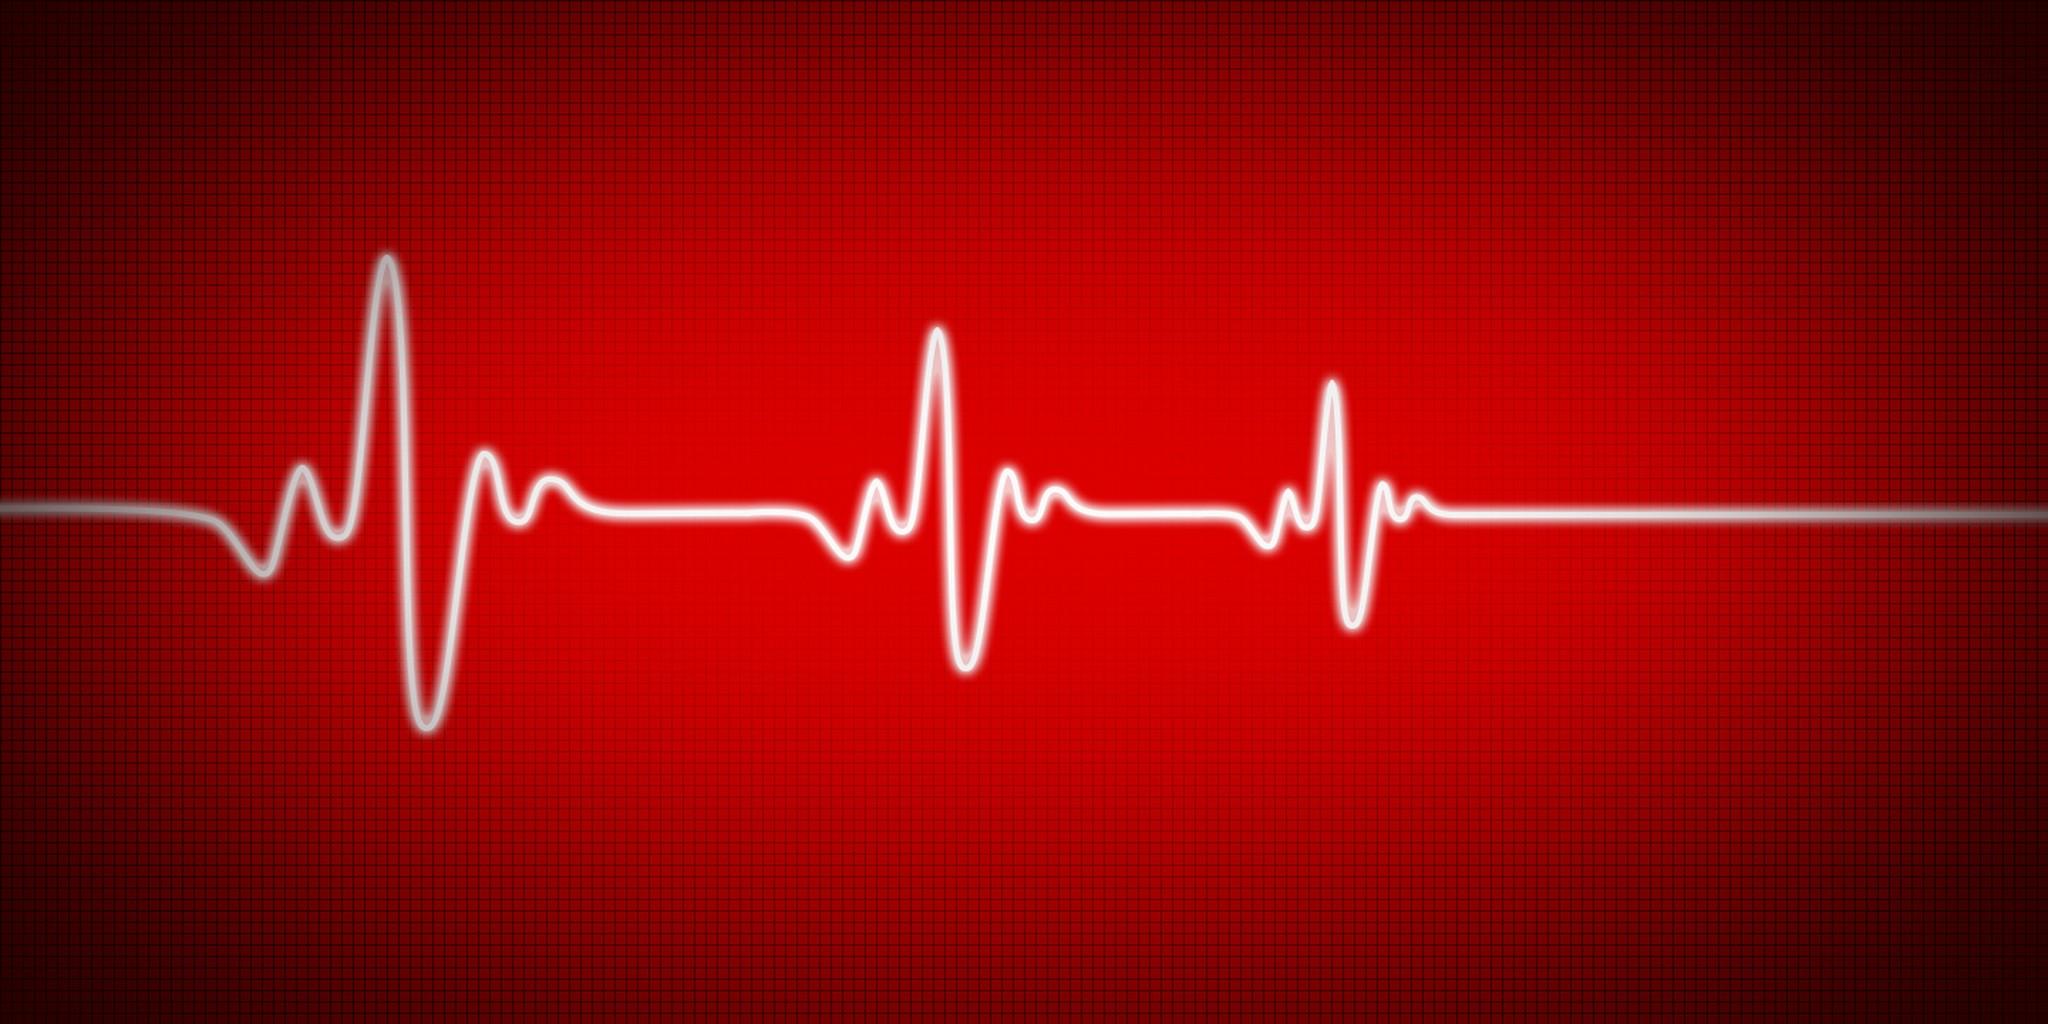 Heart monitor losing pulse